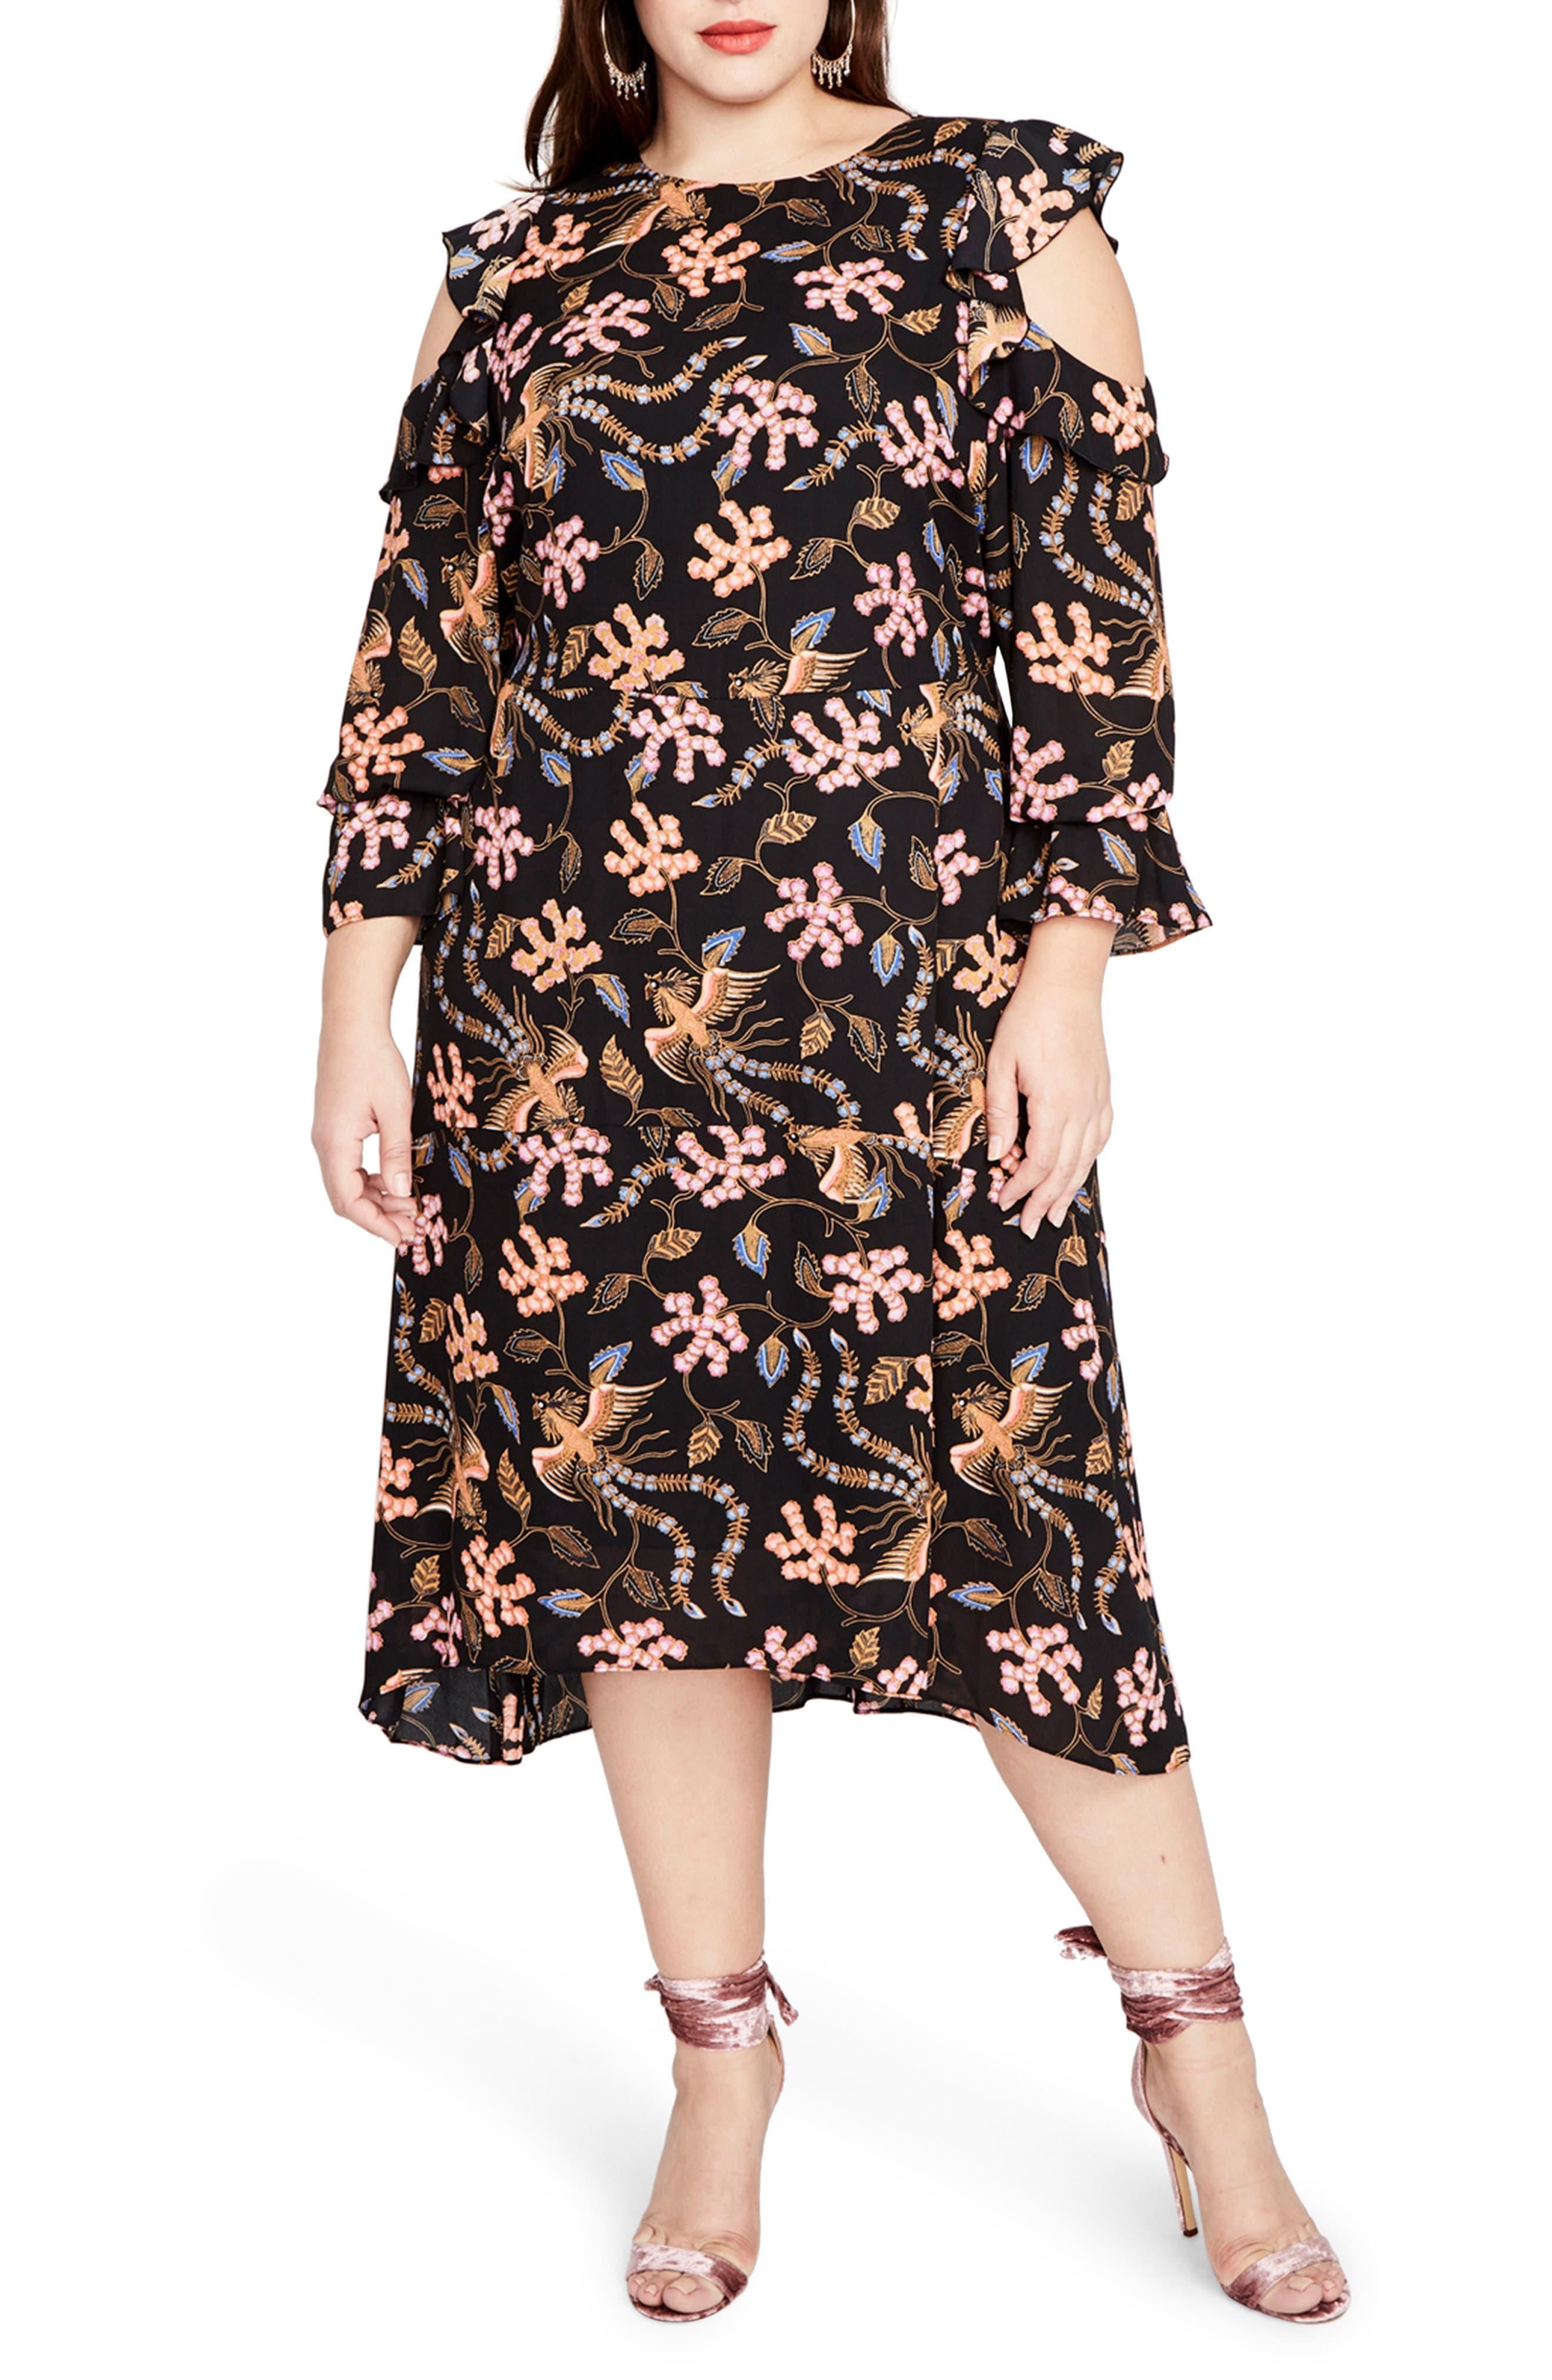 RACHEL BY Rachel Roy Cold Shoulder Ruffle Midi Dress (Plus Size)